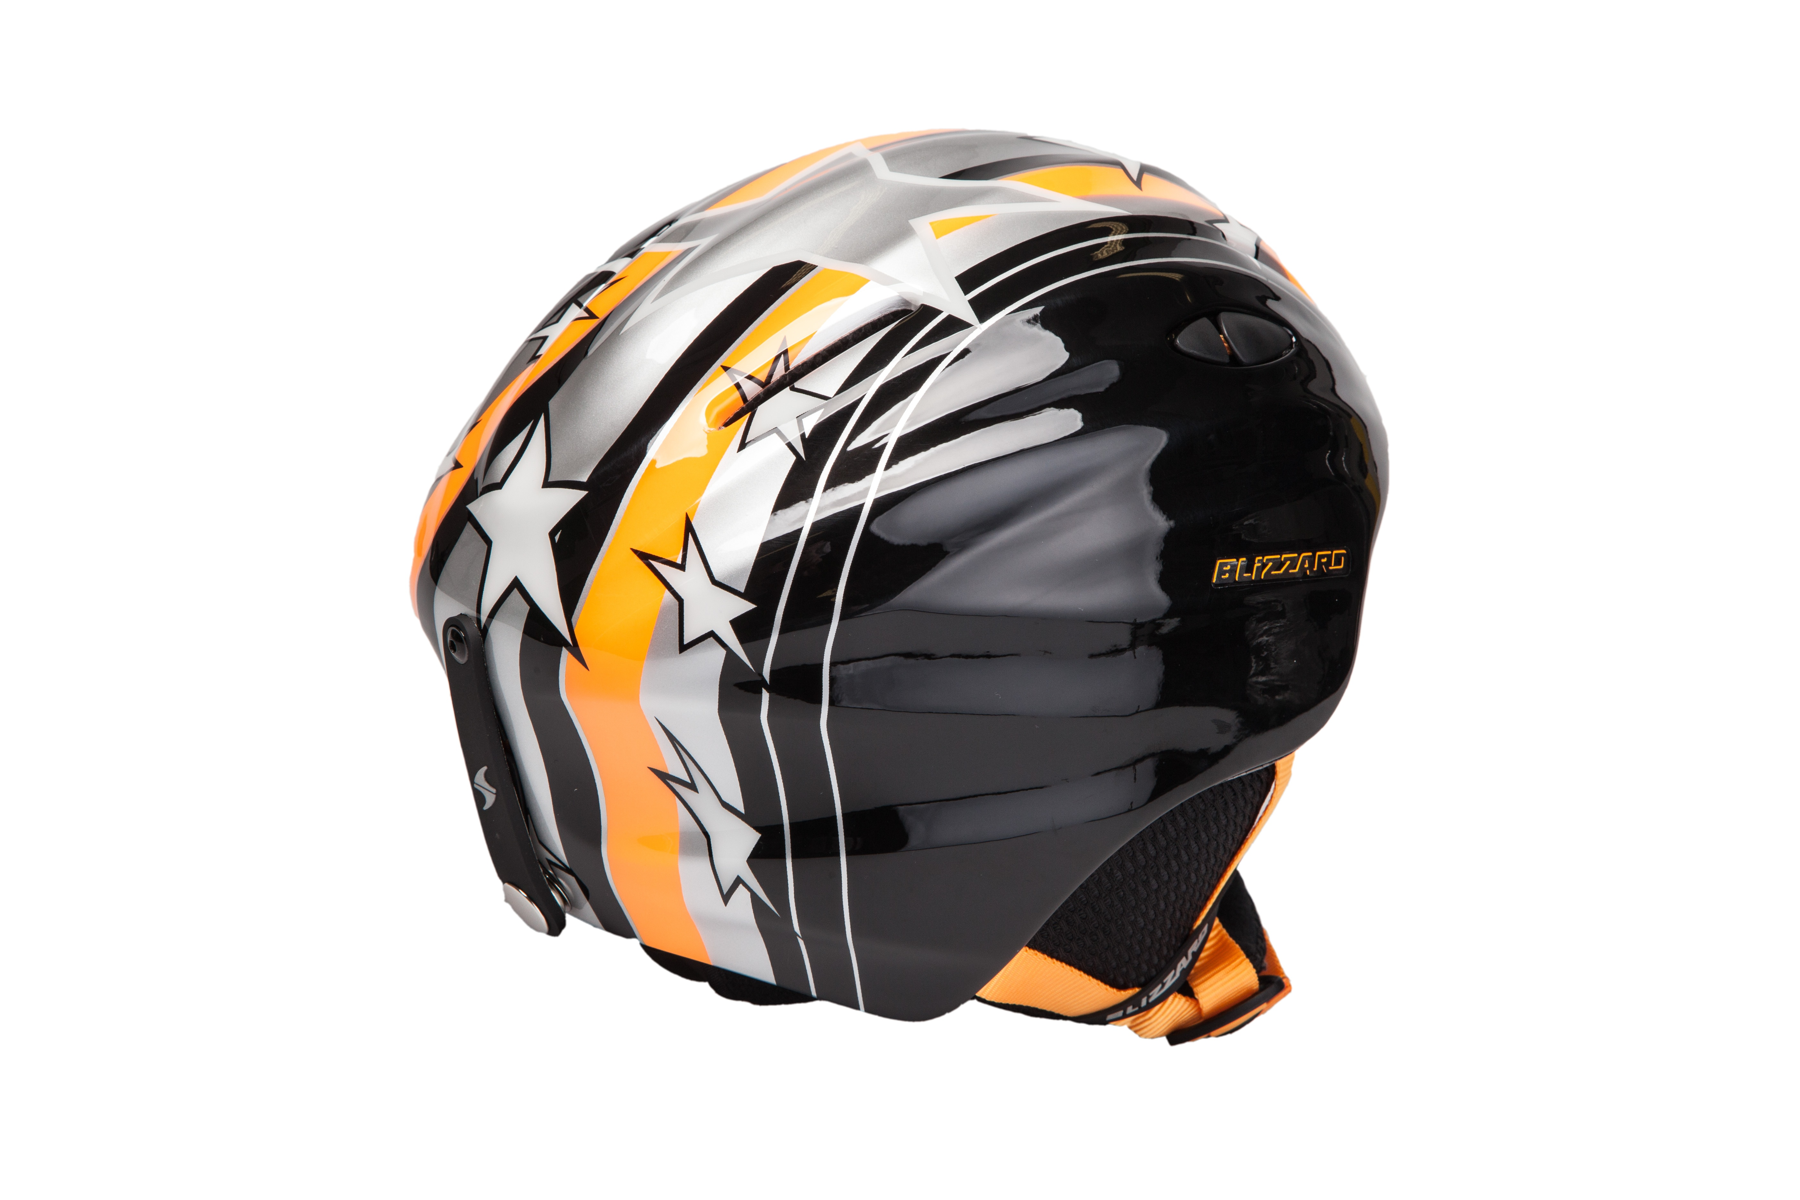 MAGNUM ski helmet